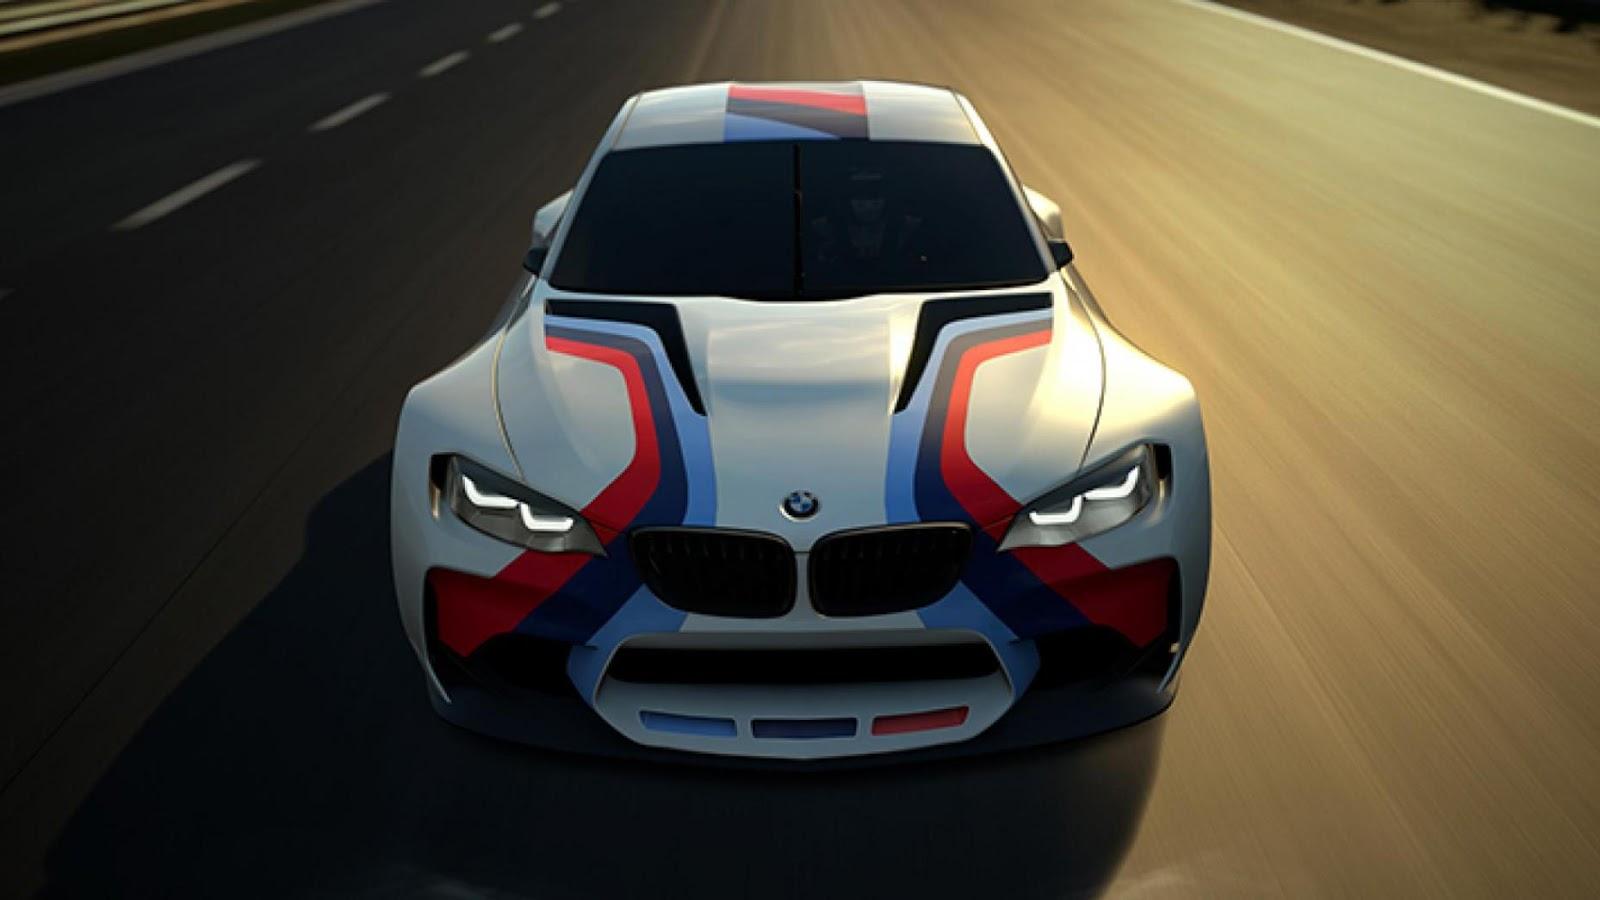 2014: BMW Vision Gran Turismo